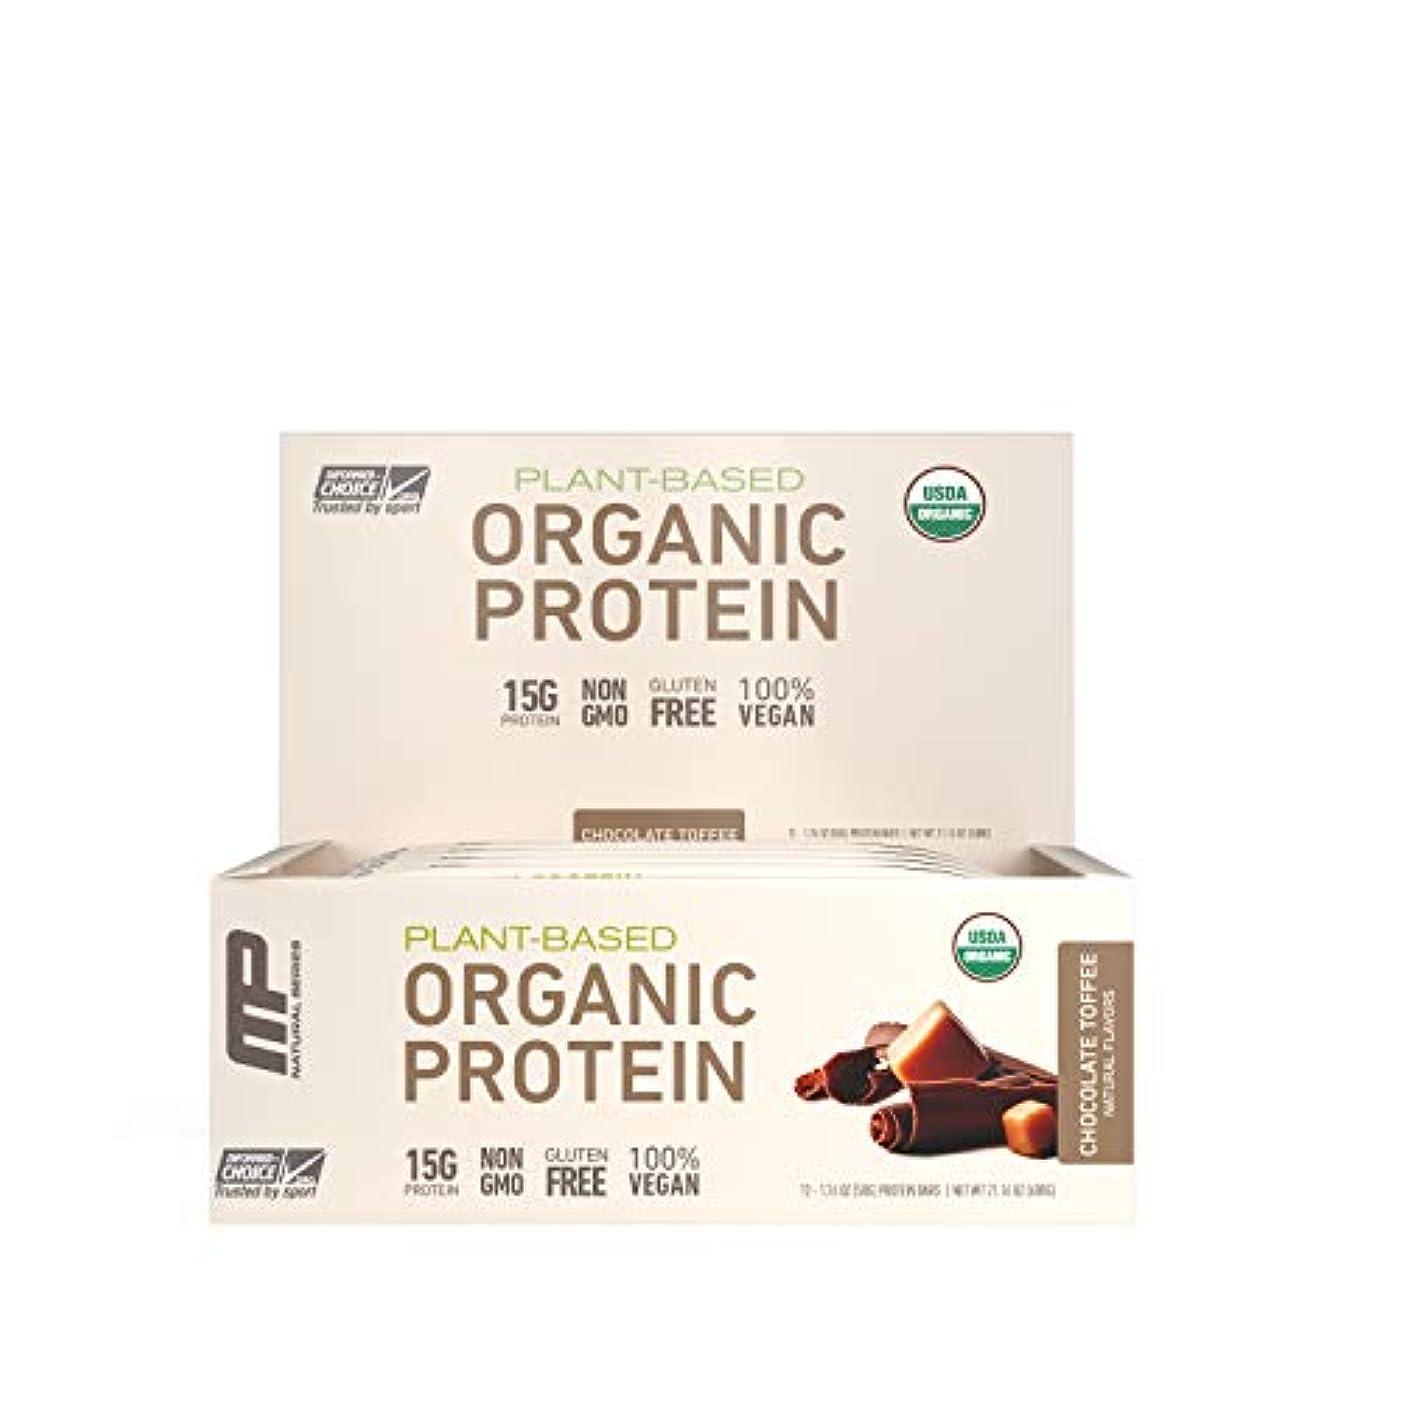 MusclePharm Natural オーガニック?プロテインバー(チョコレート?トフィー12本) (600 g) 海外直送品